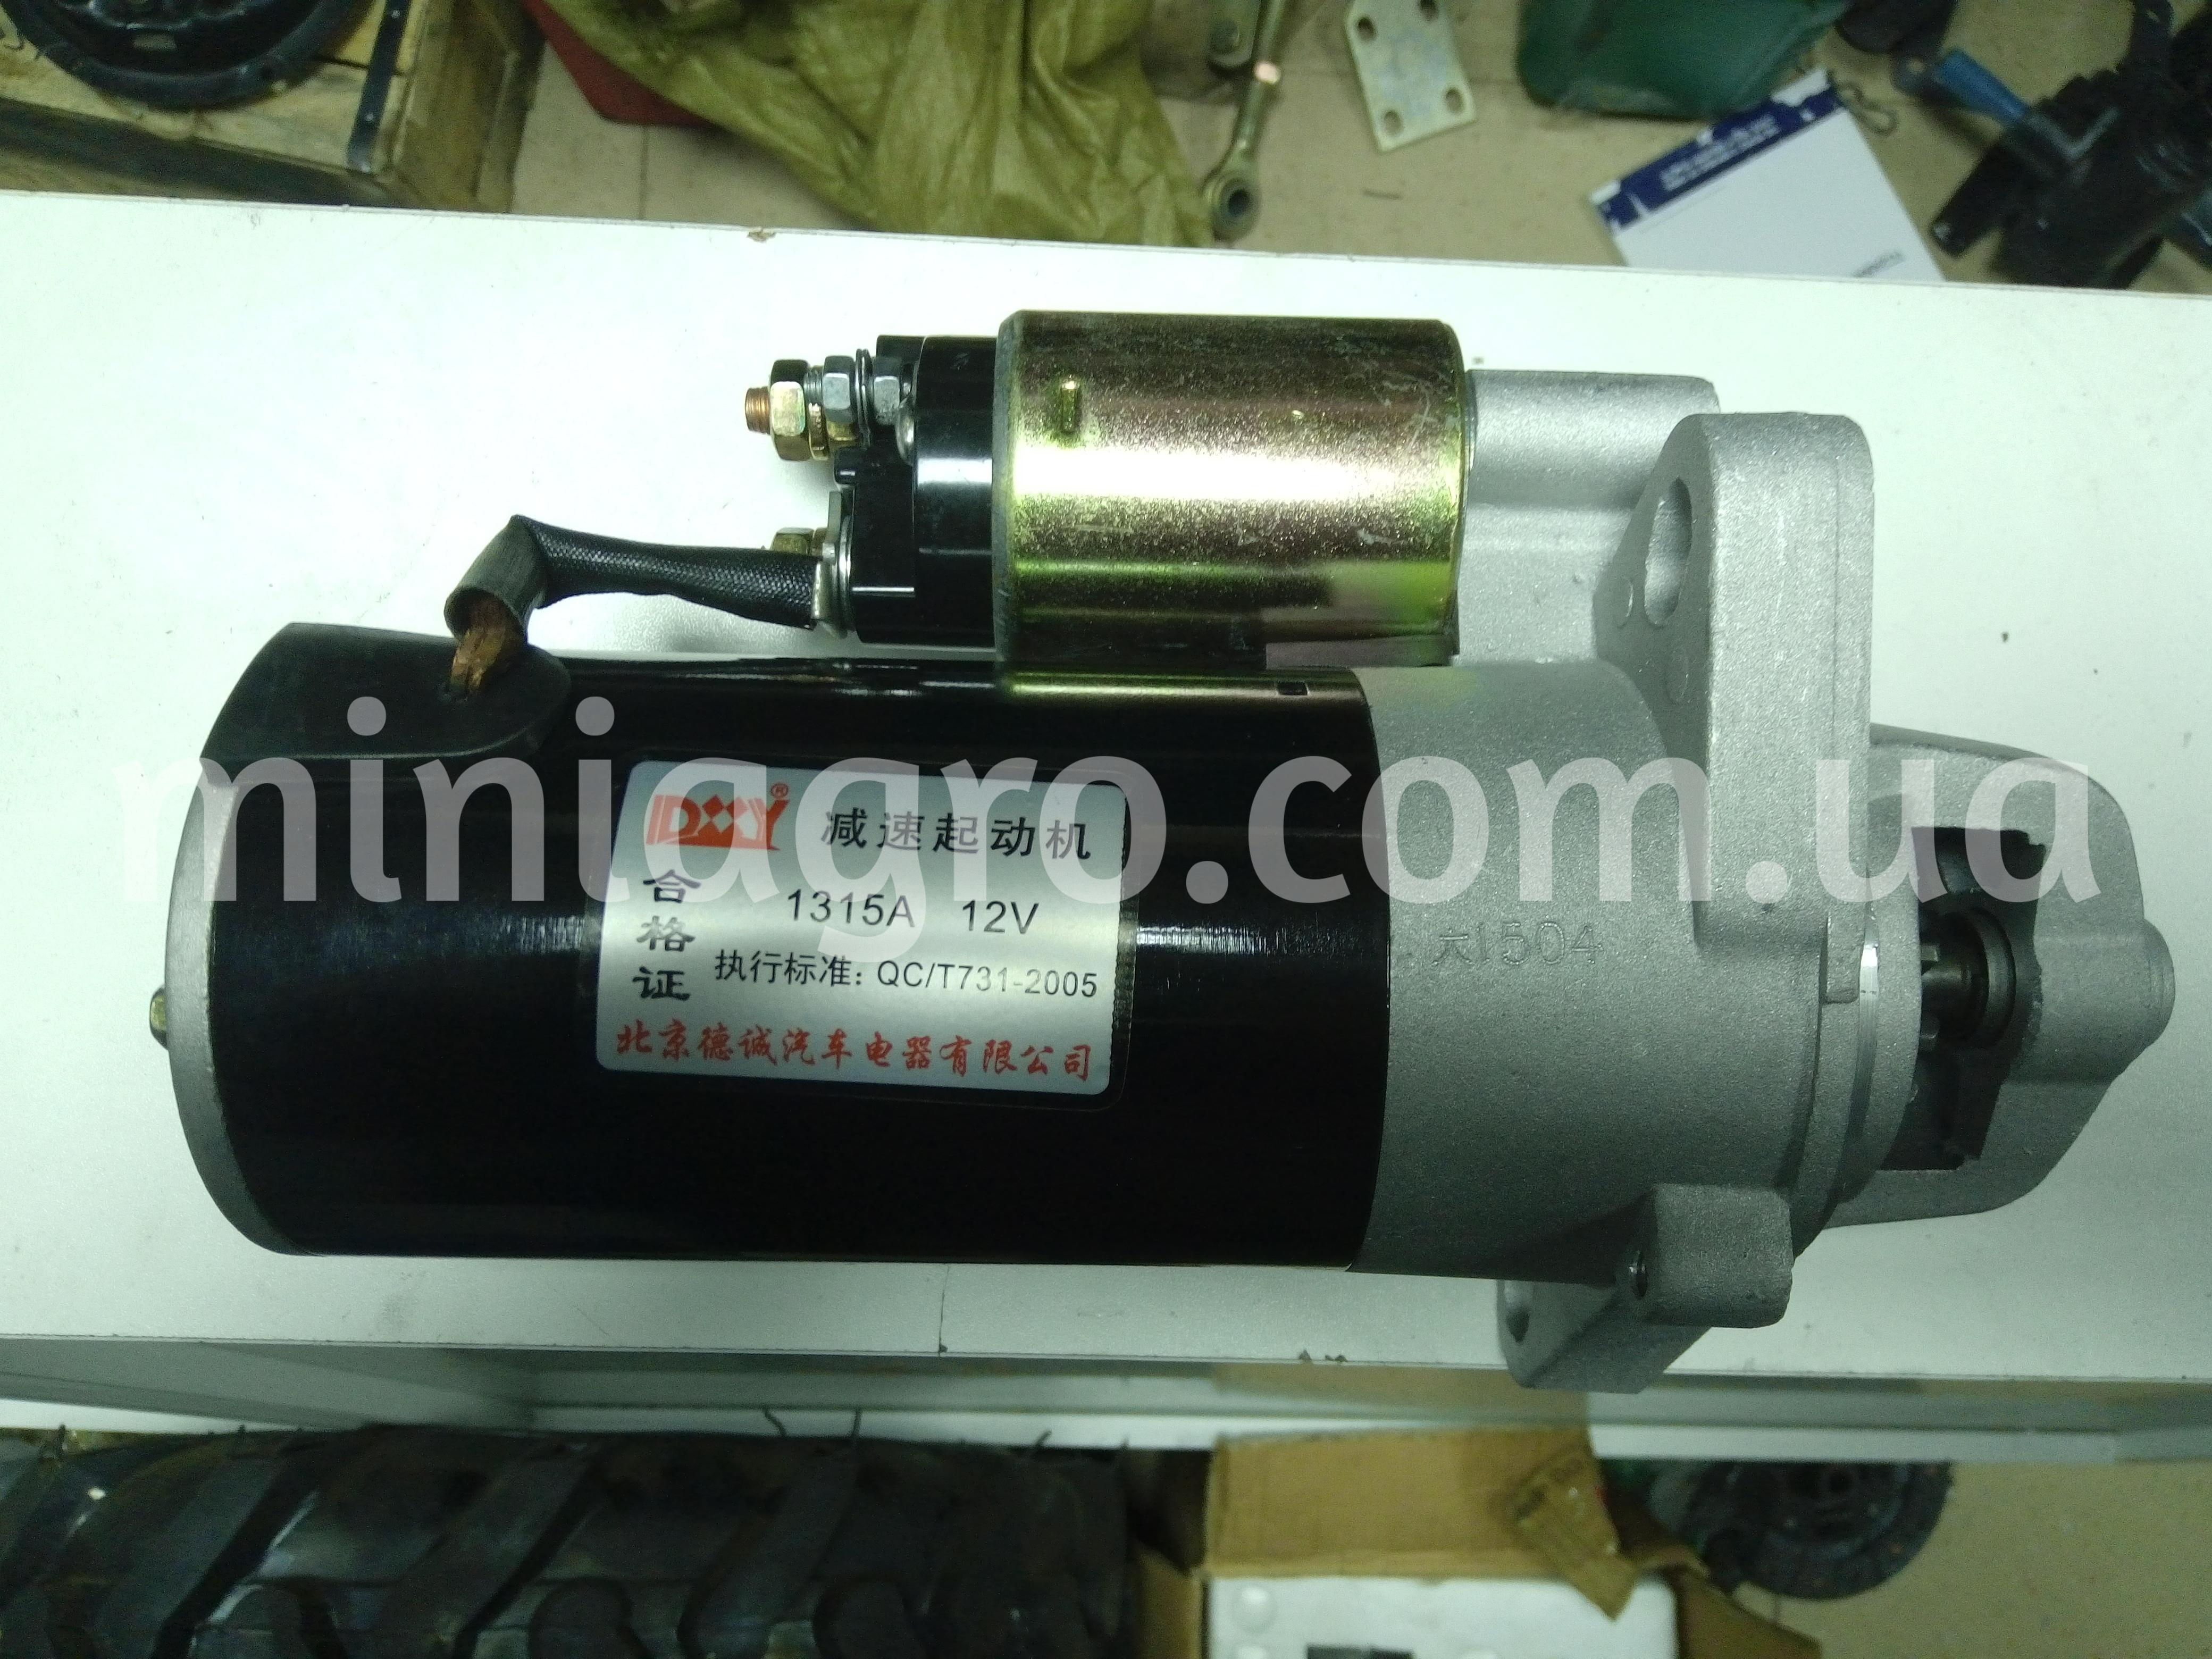 Стартер  к мототрактору Xingtai XT120-160